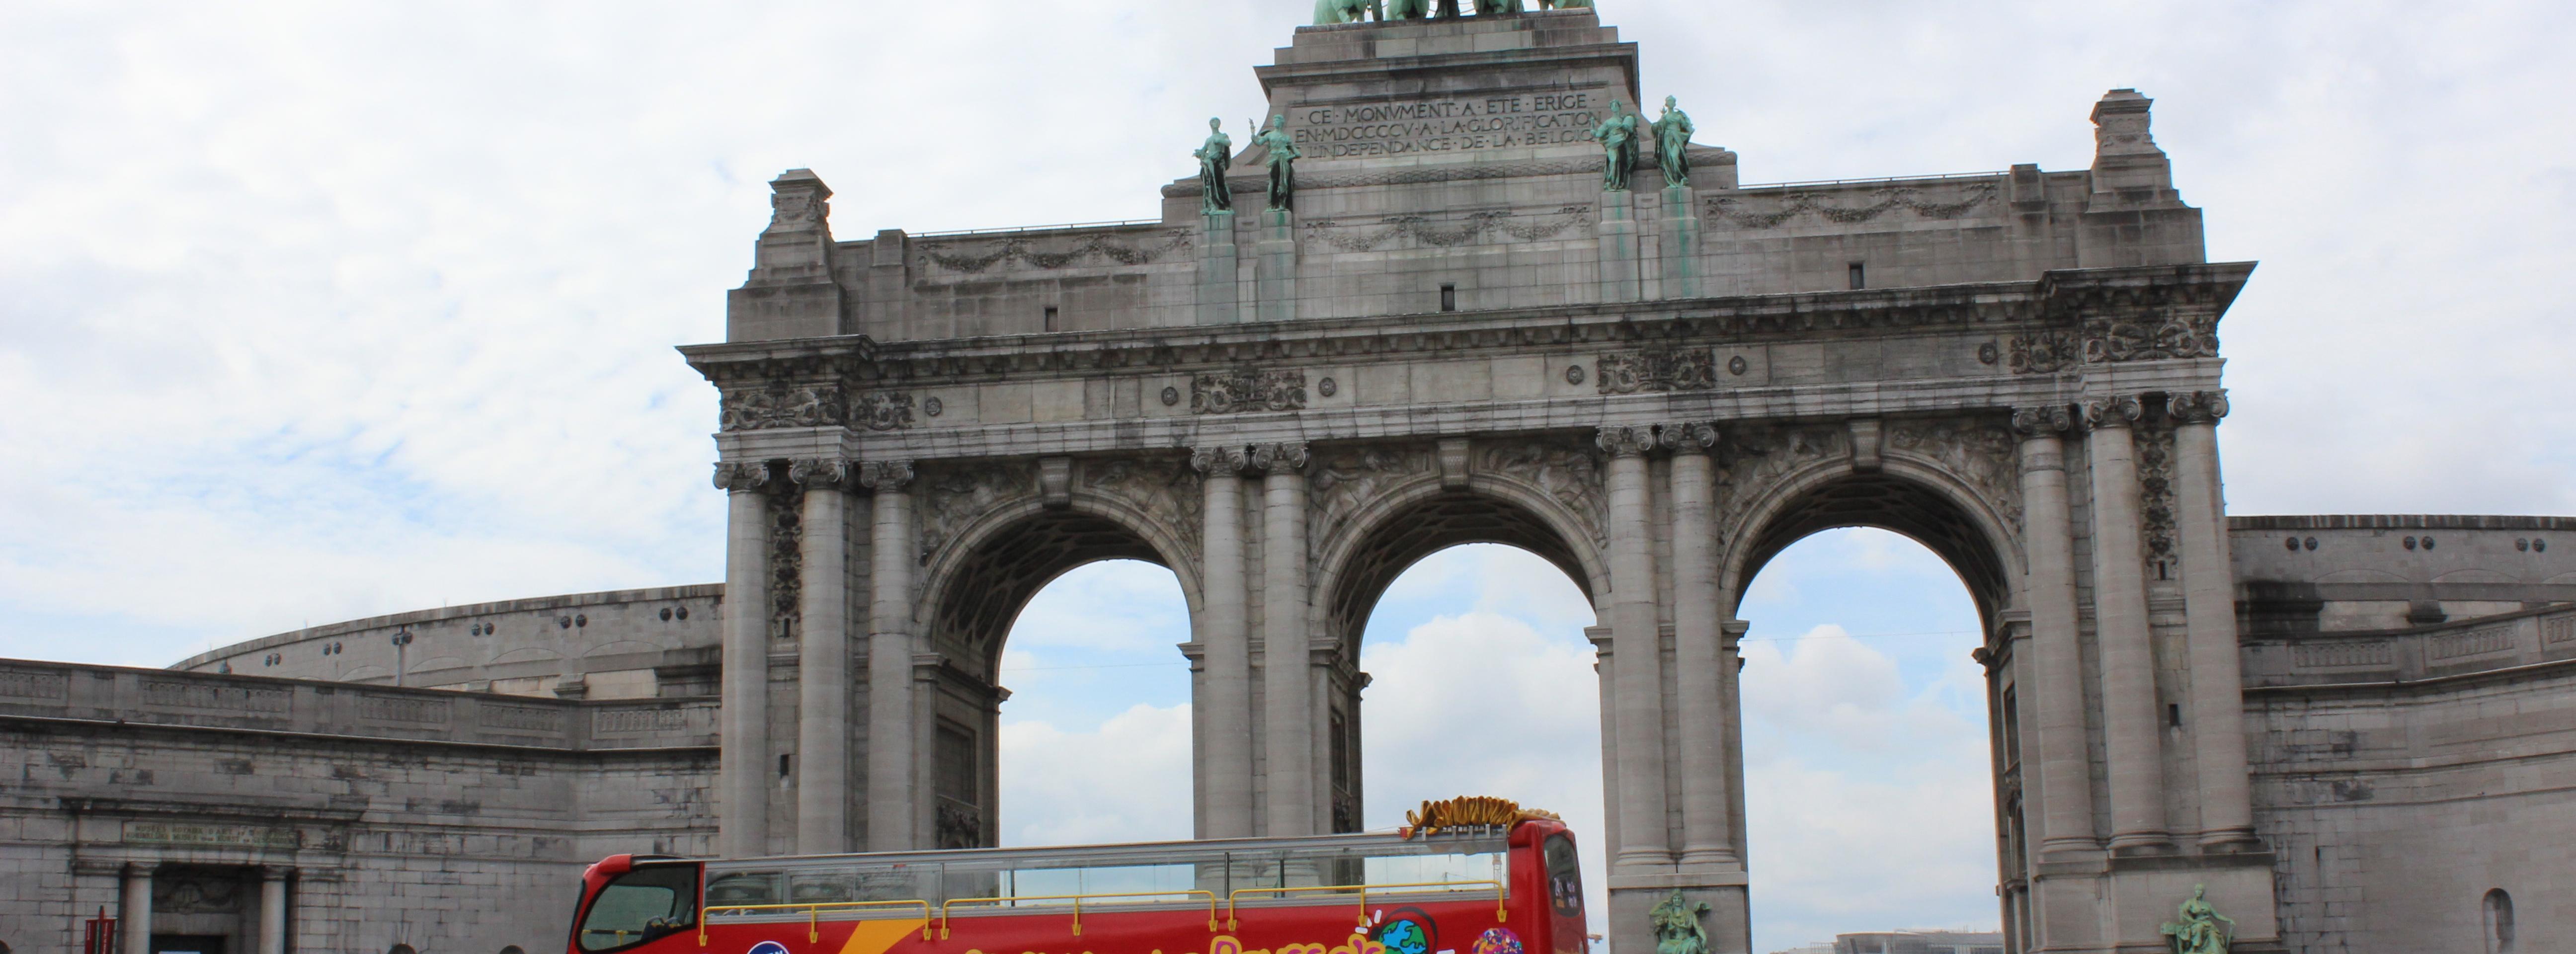 ,Tour por Bruselas,Tour en autobús